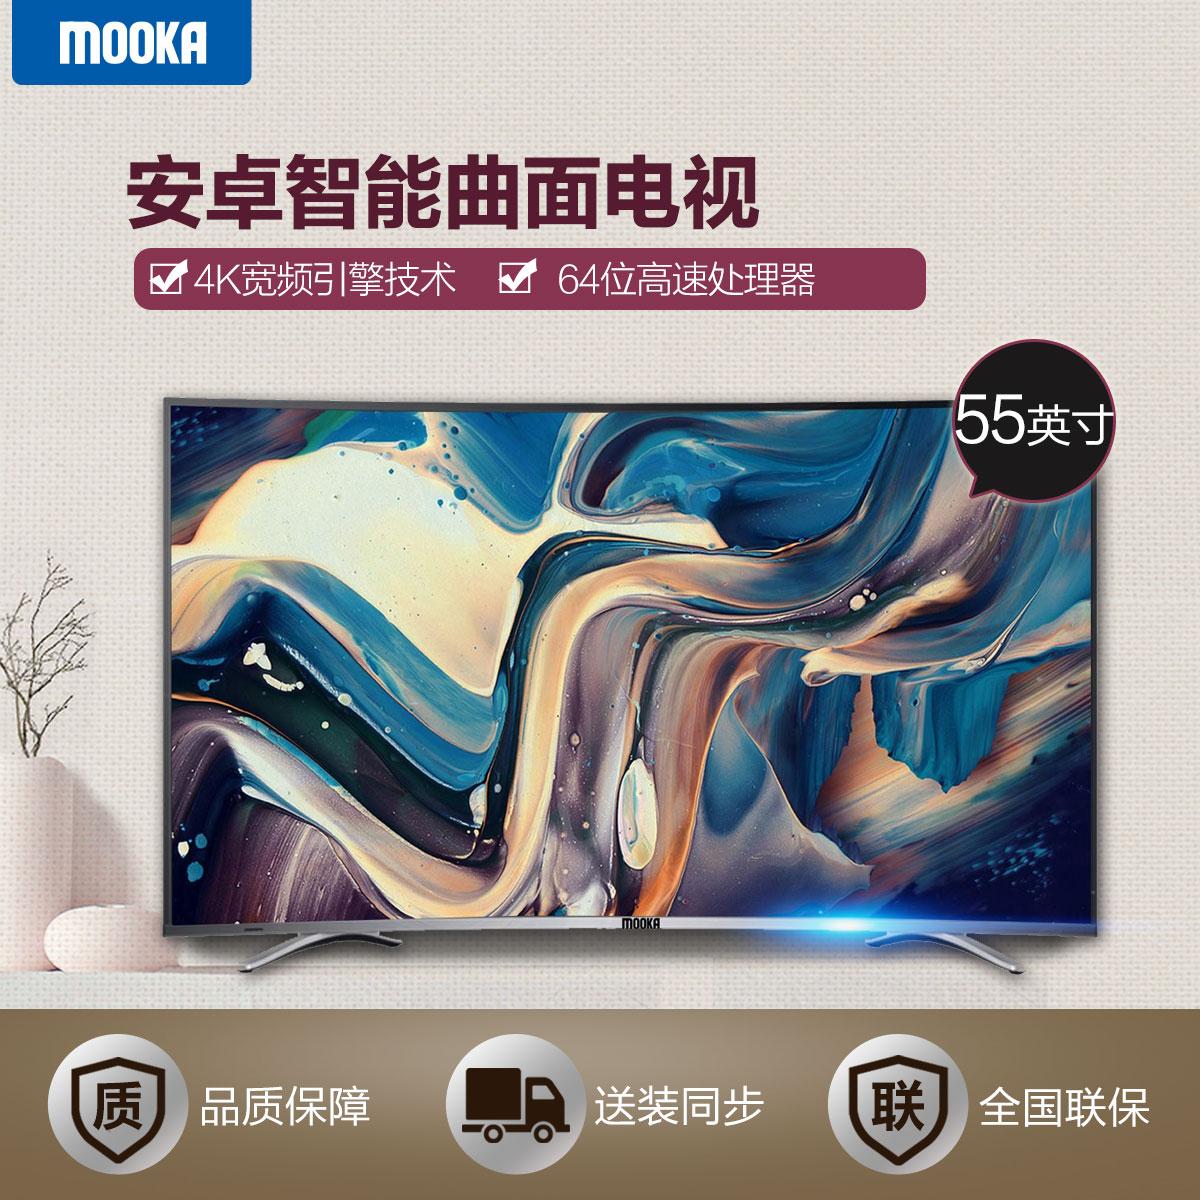 MOOKA/模卡 智能电视 55Q3M